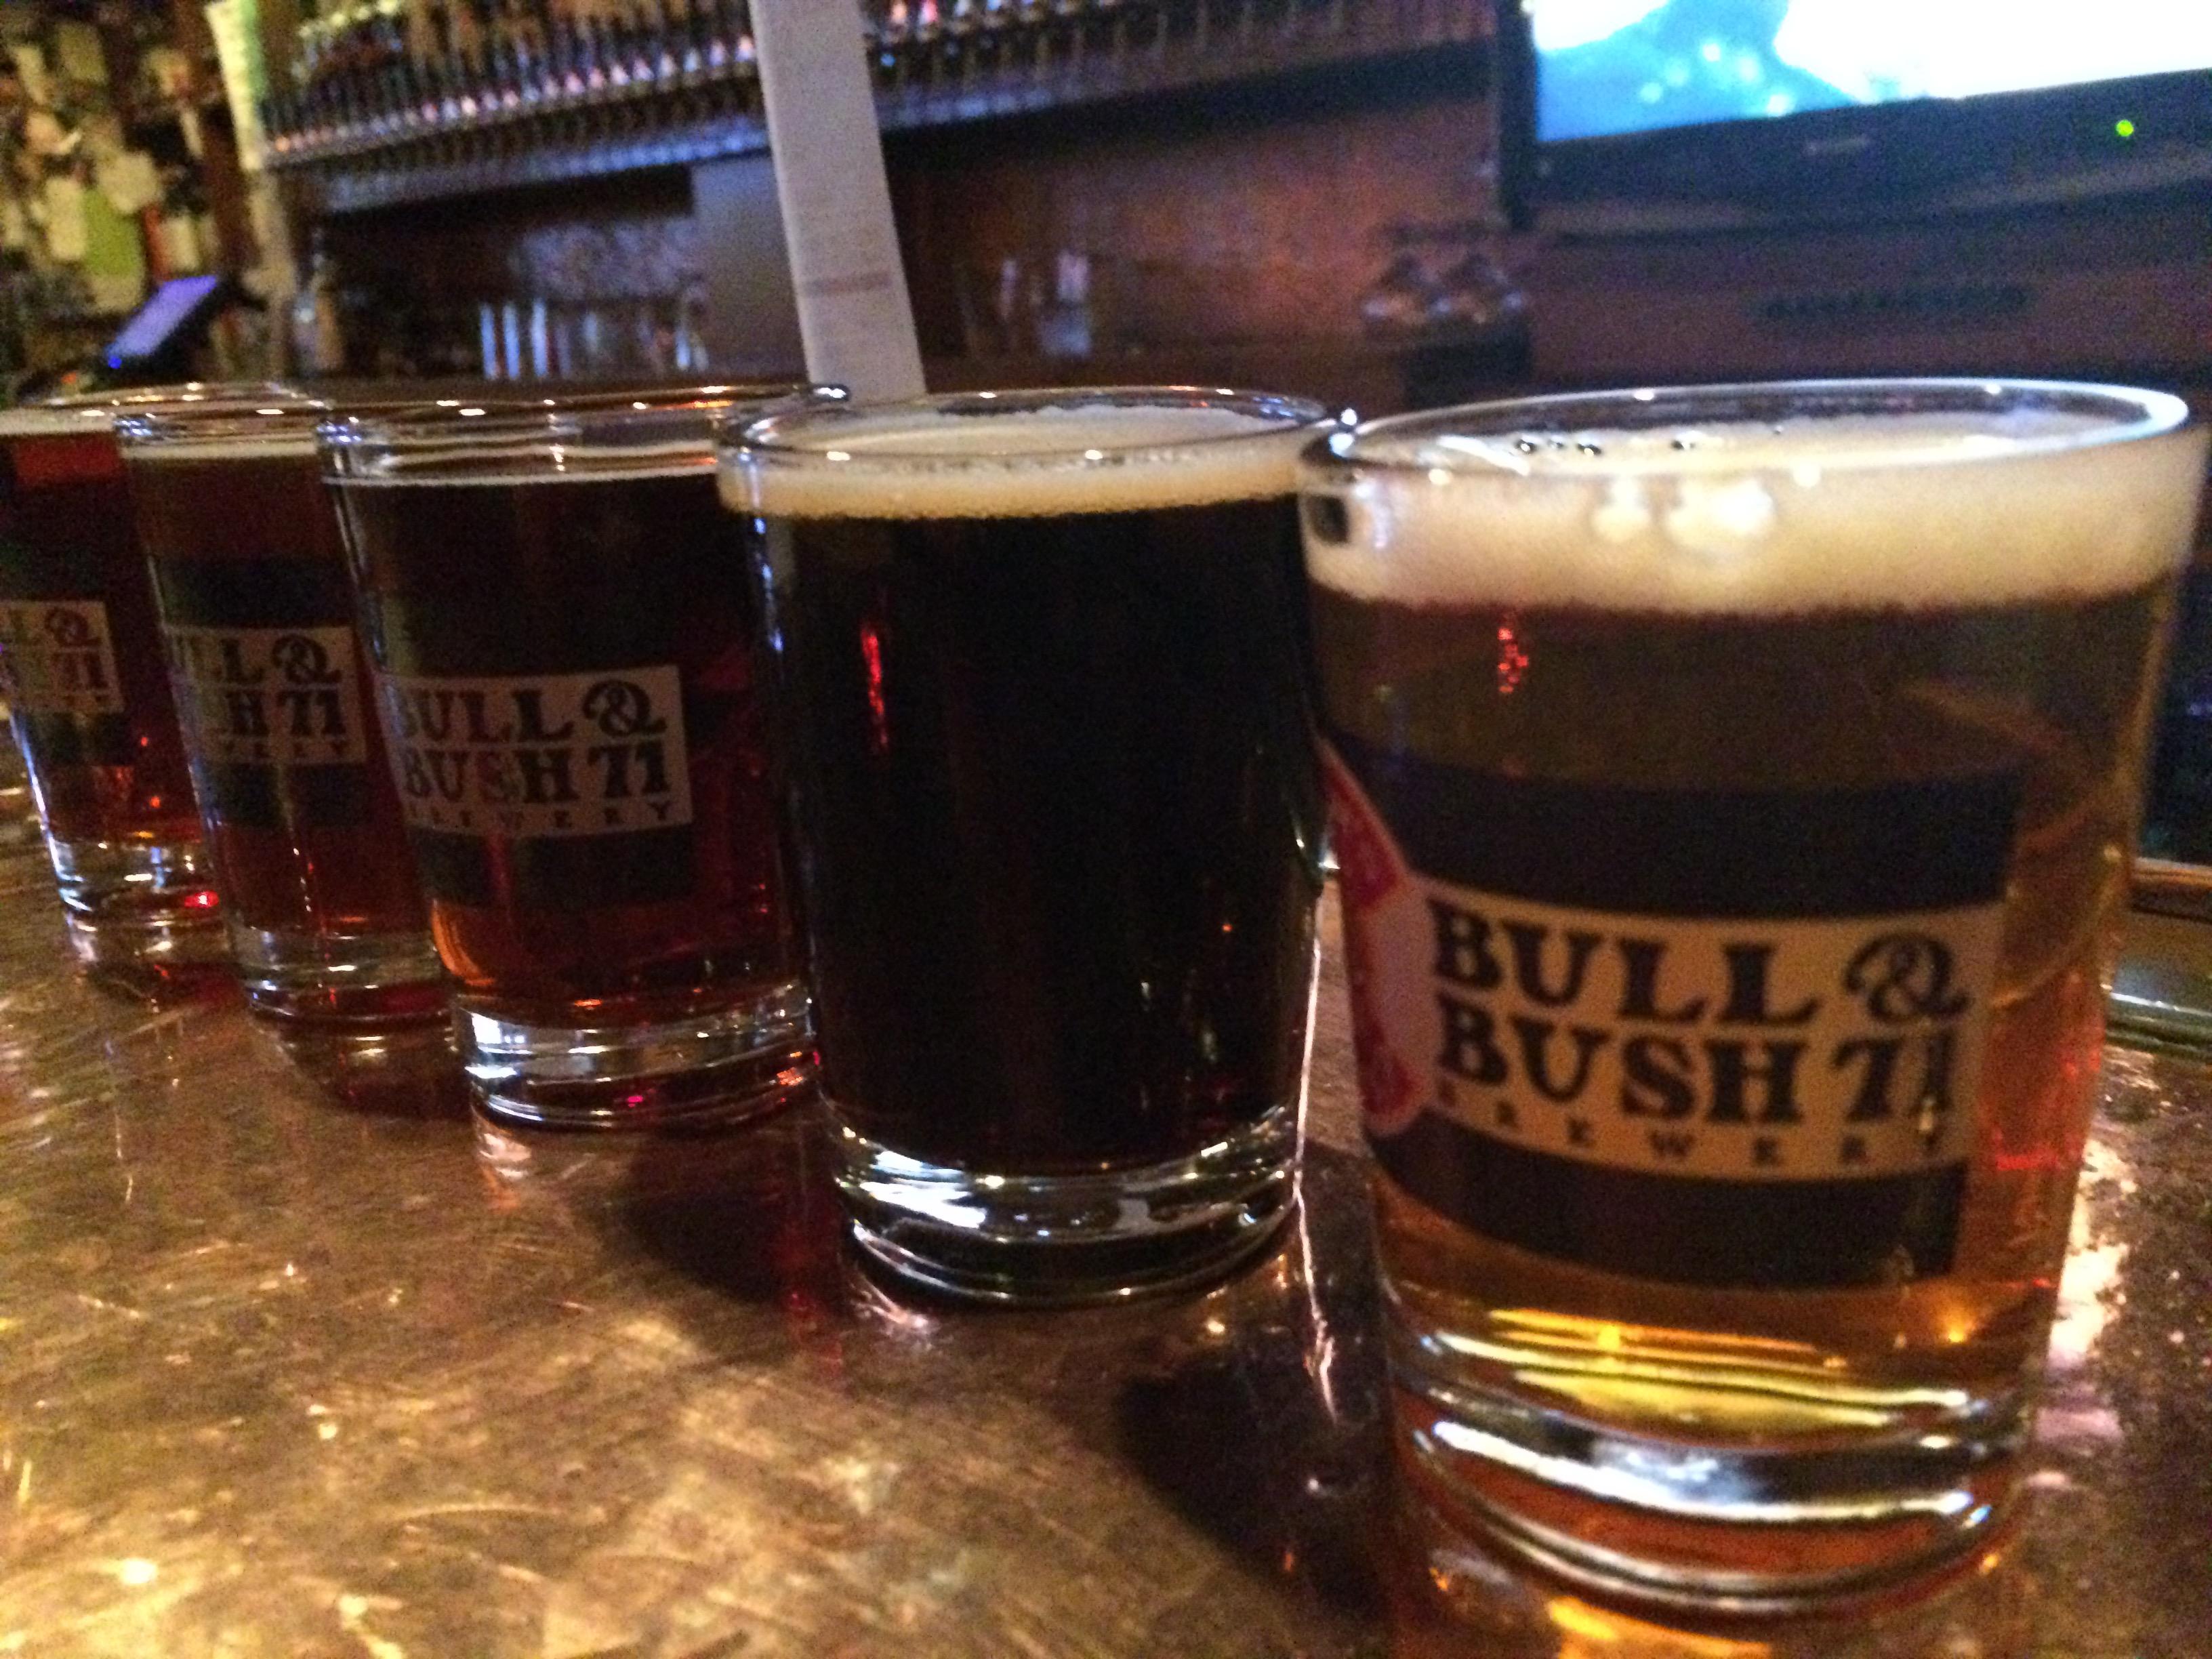 beer-bull___bush-denver-co-bar-microbrewery-tf_tour__18_